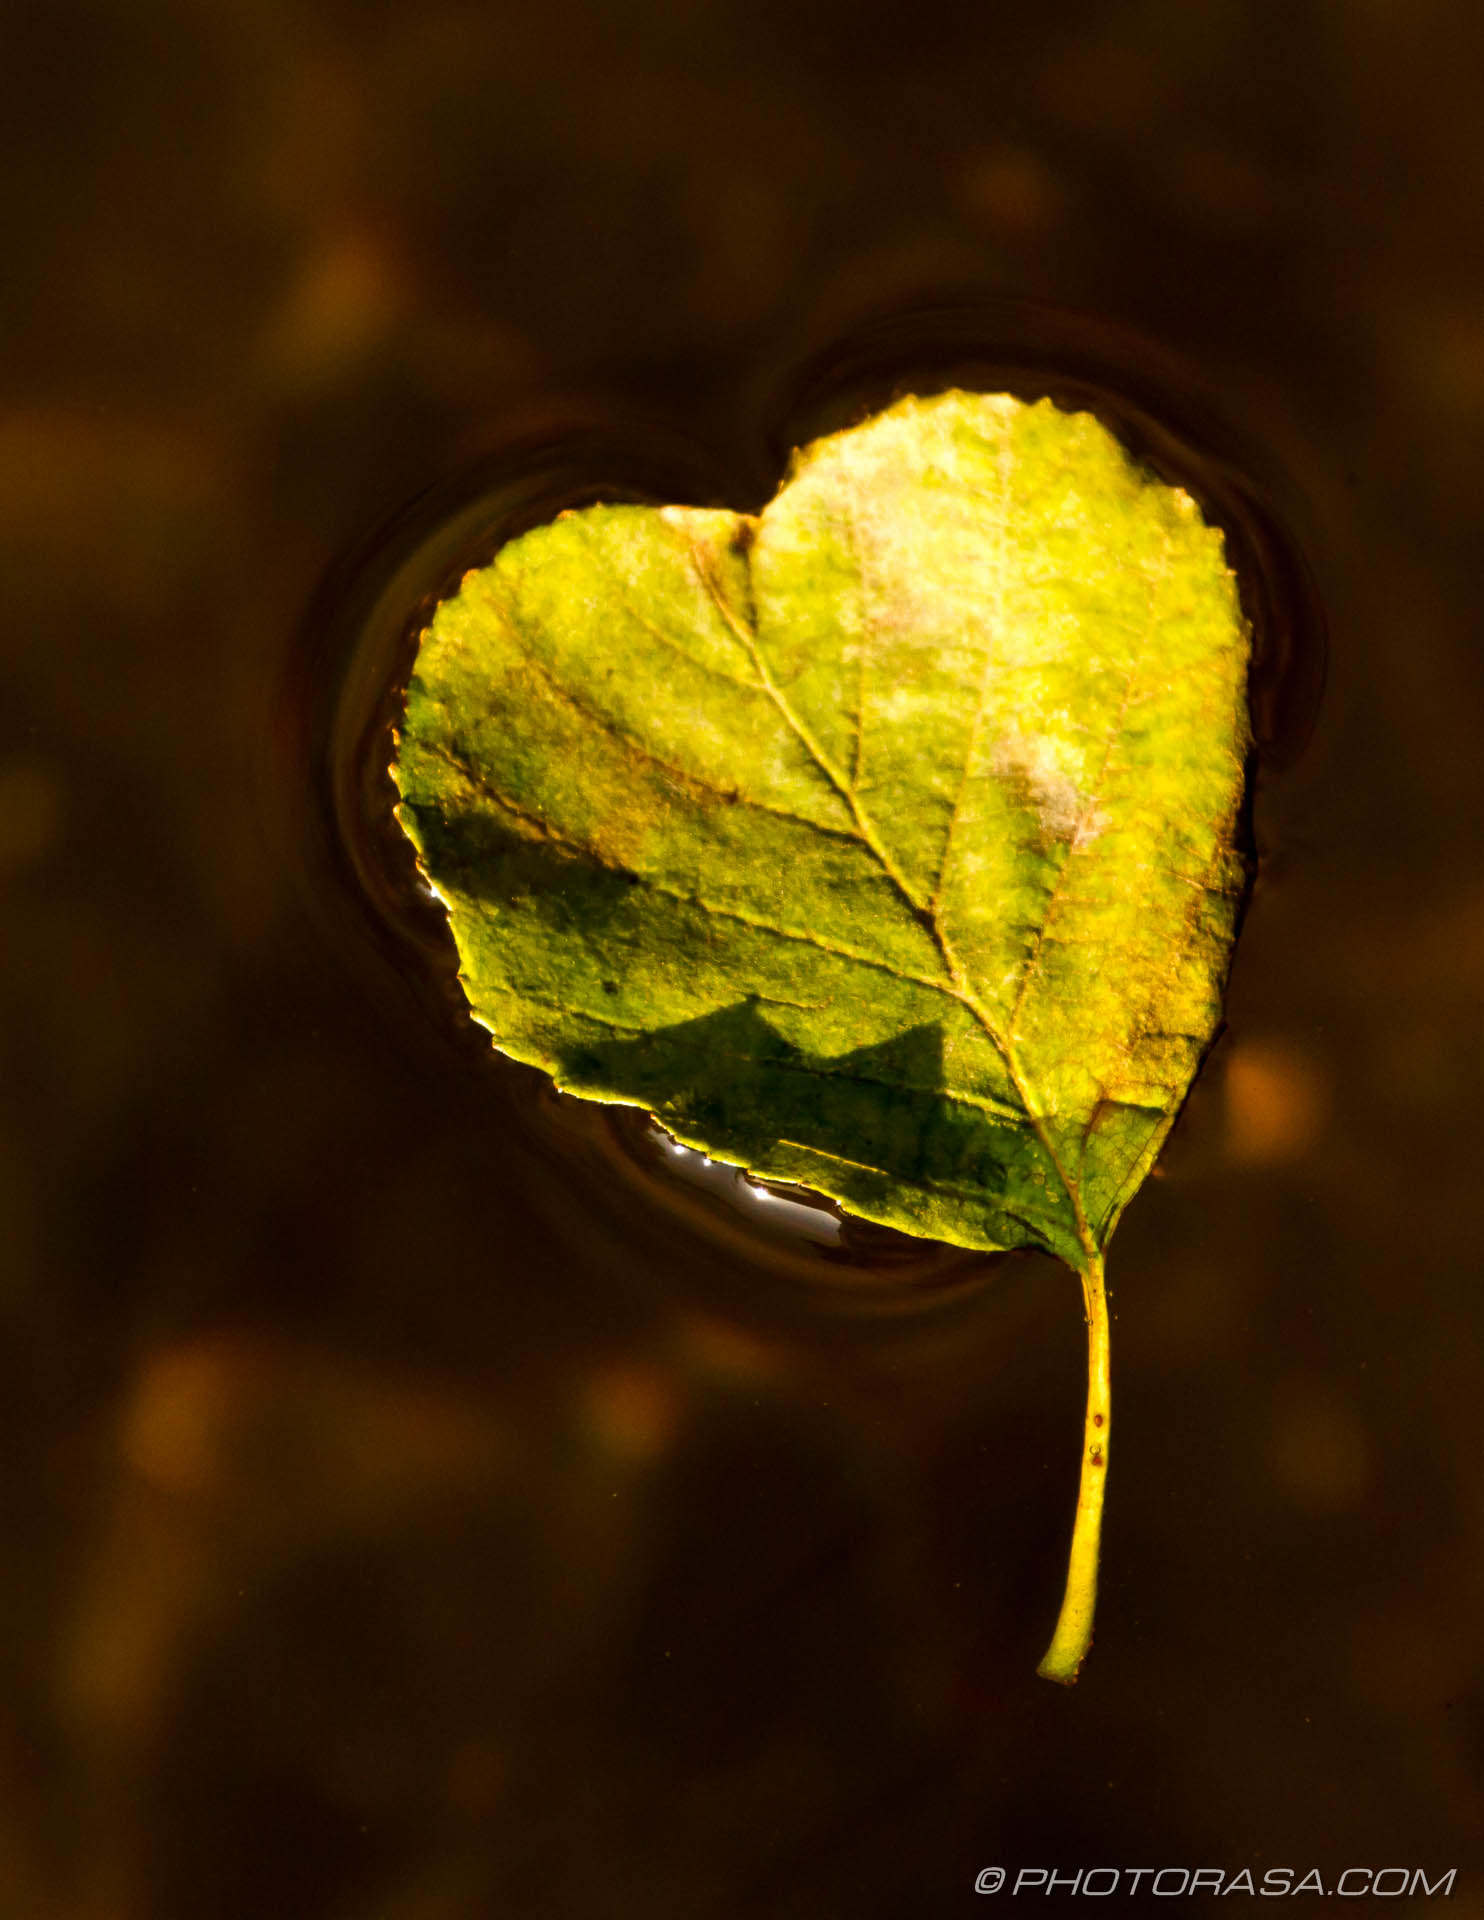 https://photorasa.com/leaves/heart-shaped-leaf-and-stalk/